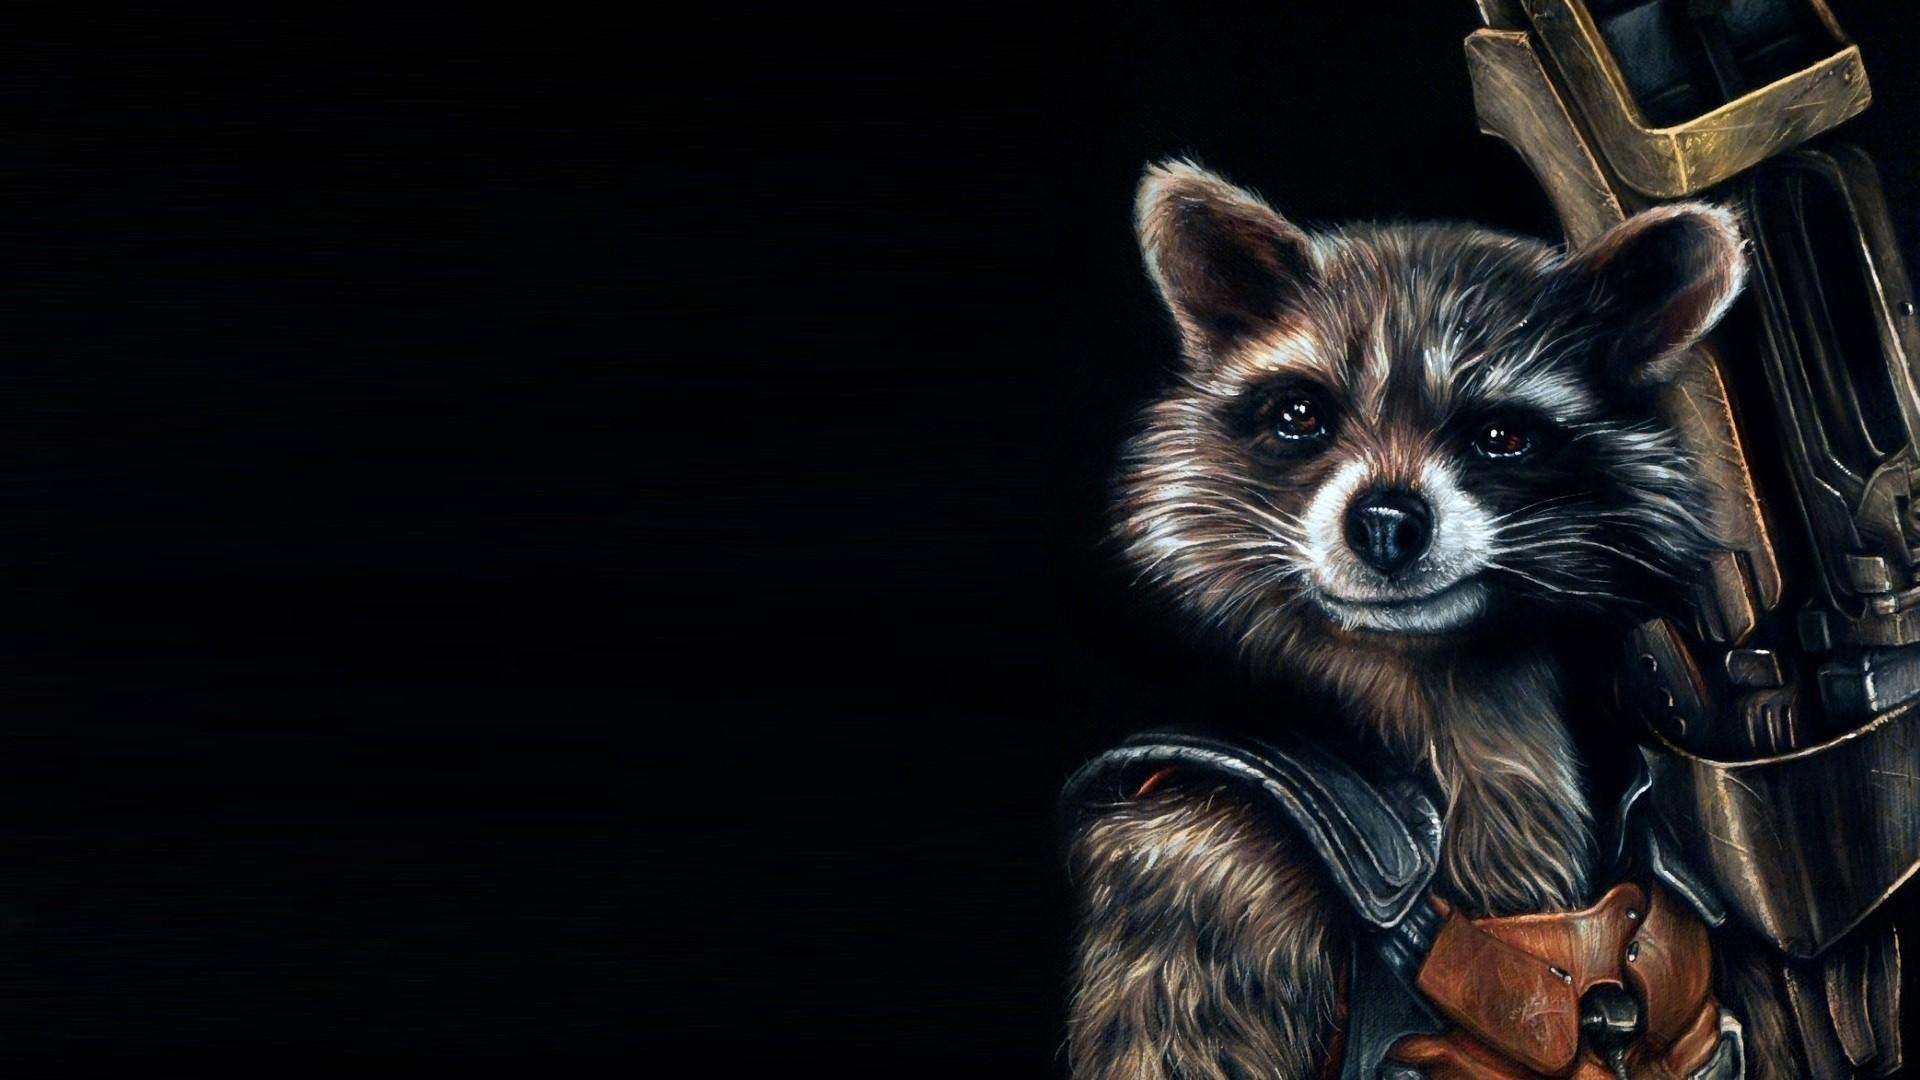 Wallpaper guardians of the galaxy, raccoon, rocket